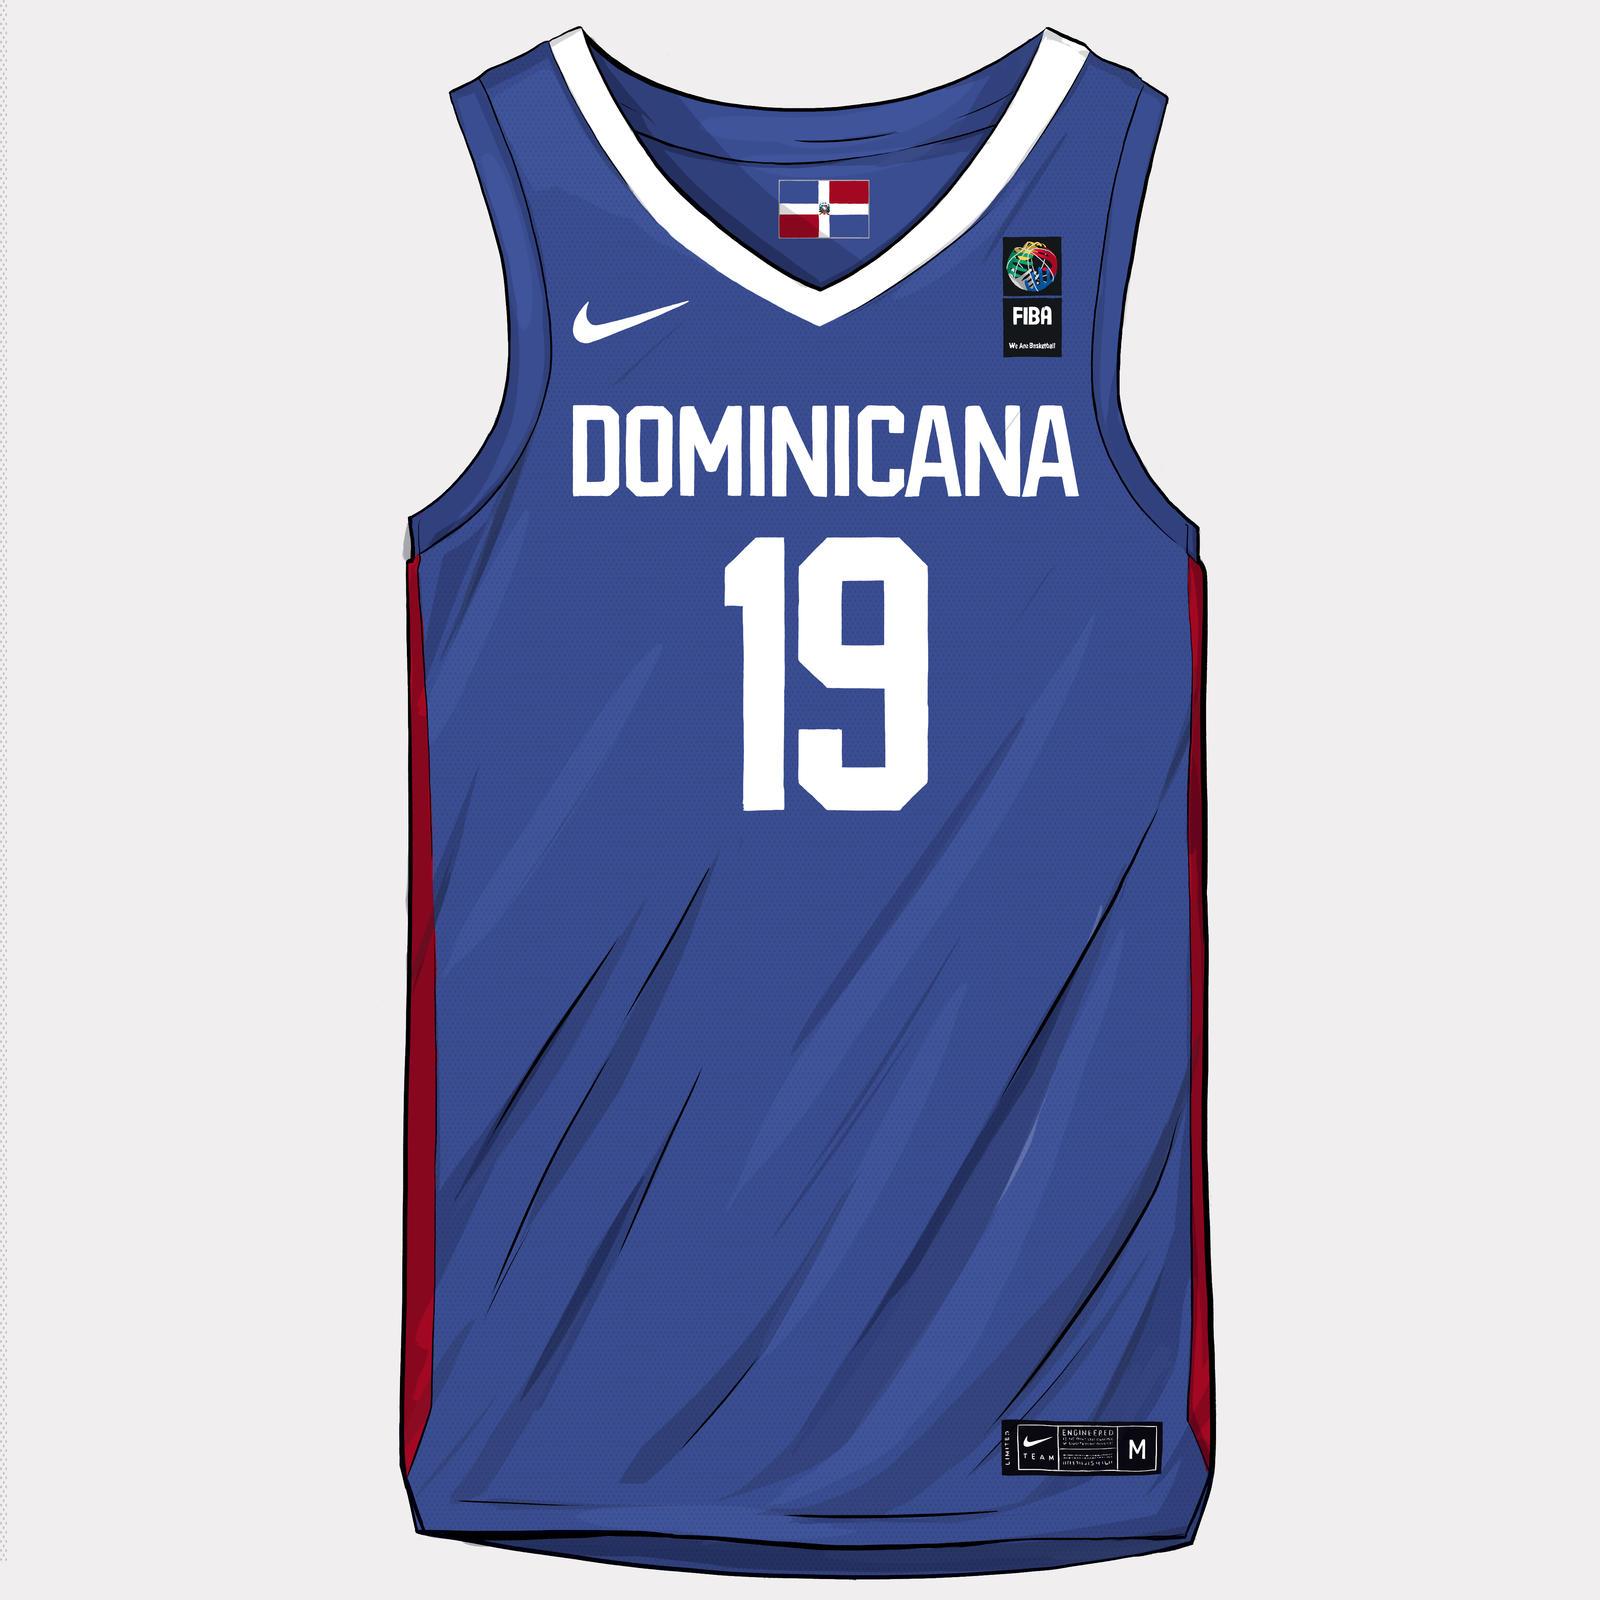 nike-news-dominican-republic-national-team-kit-2019-illustration-1x1_1_square_1600.jpg